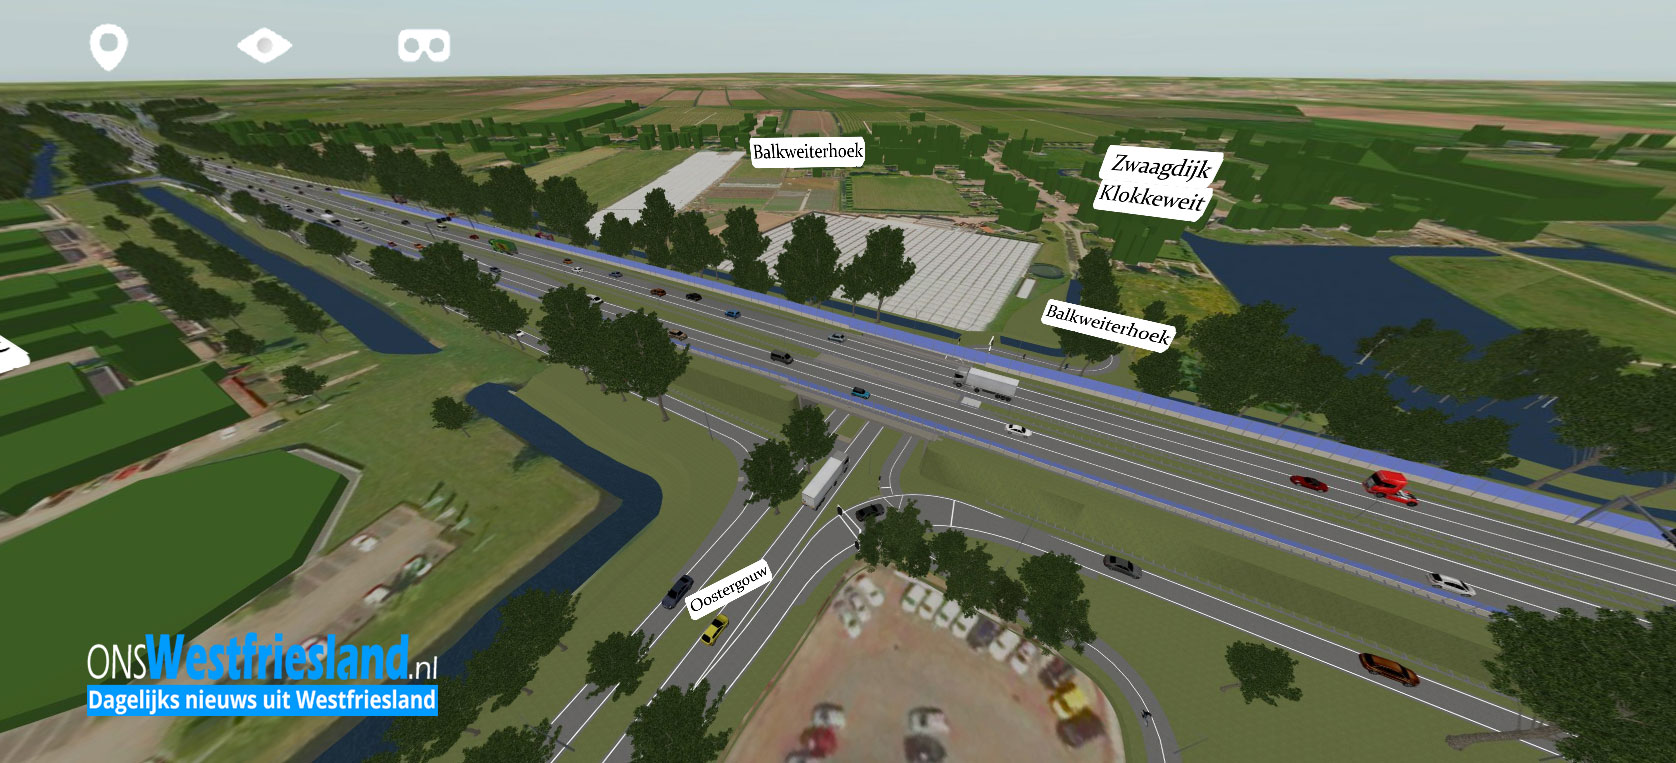 Nieuwe visualisatie N23 Westfrisiaweg te bekijken met VR bril